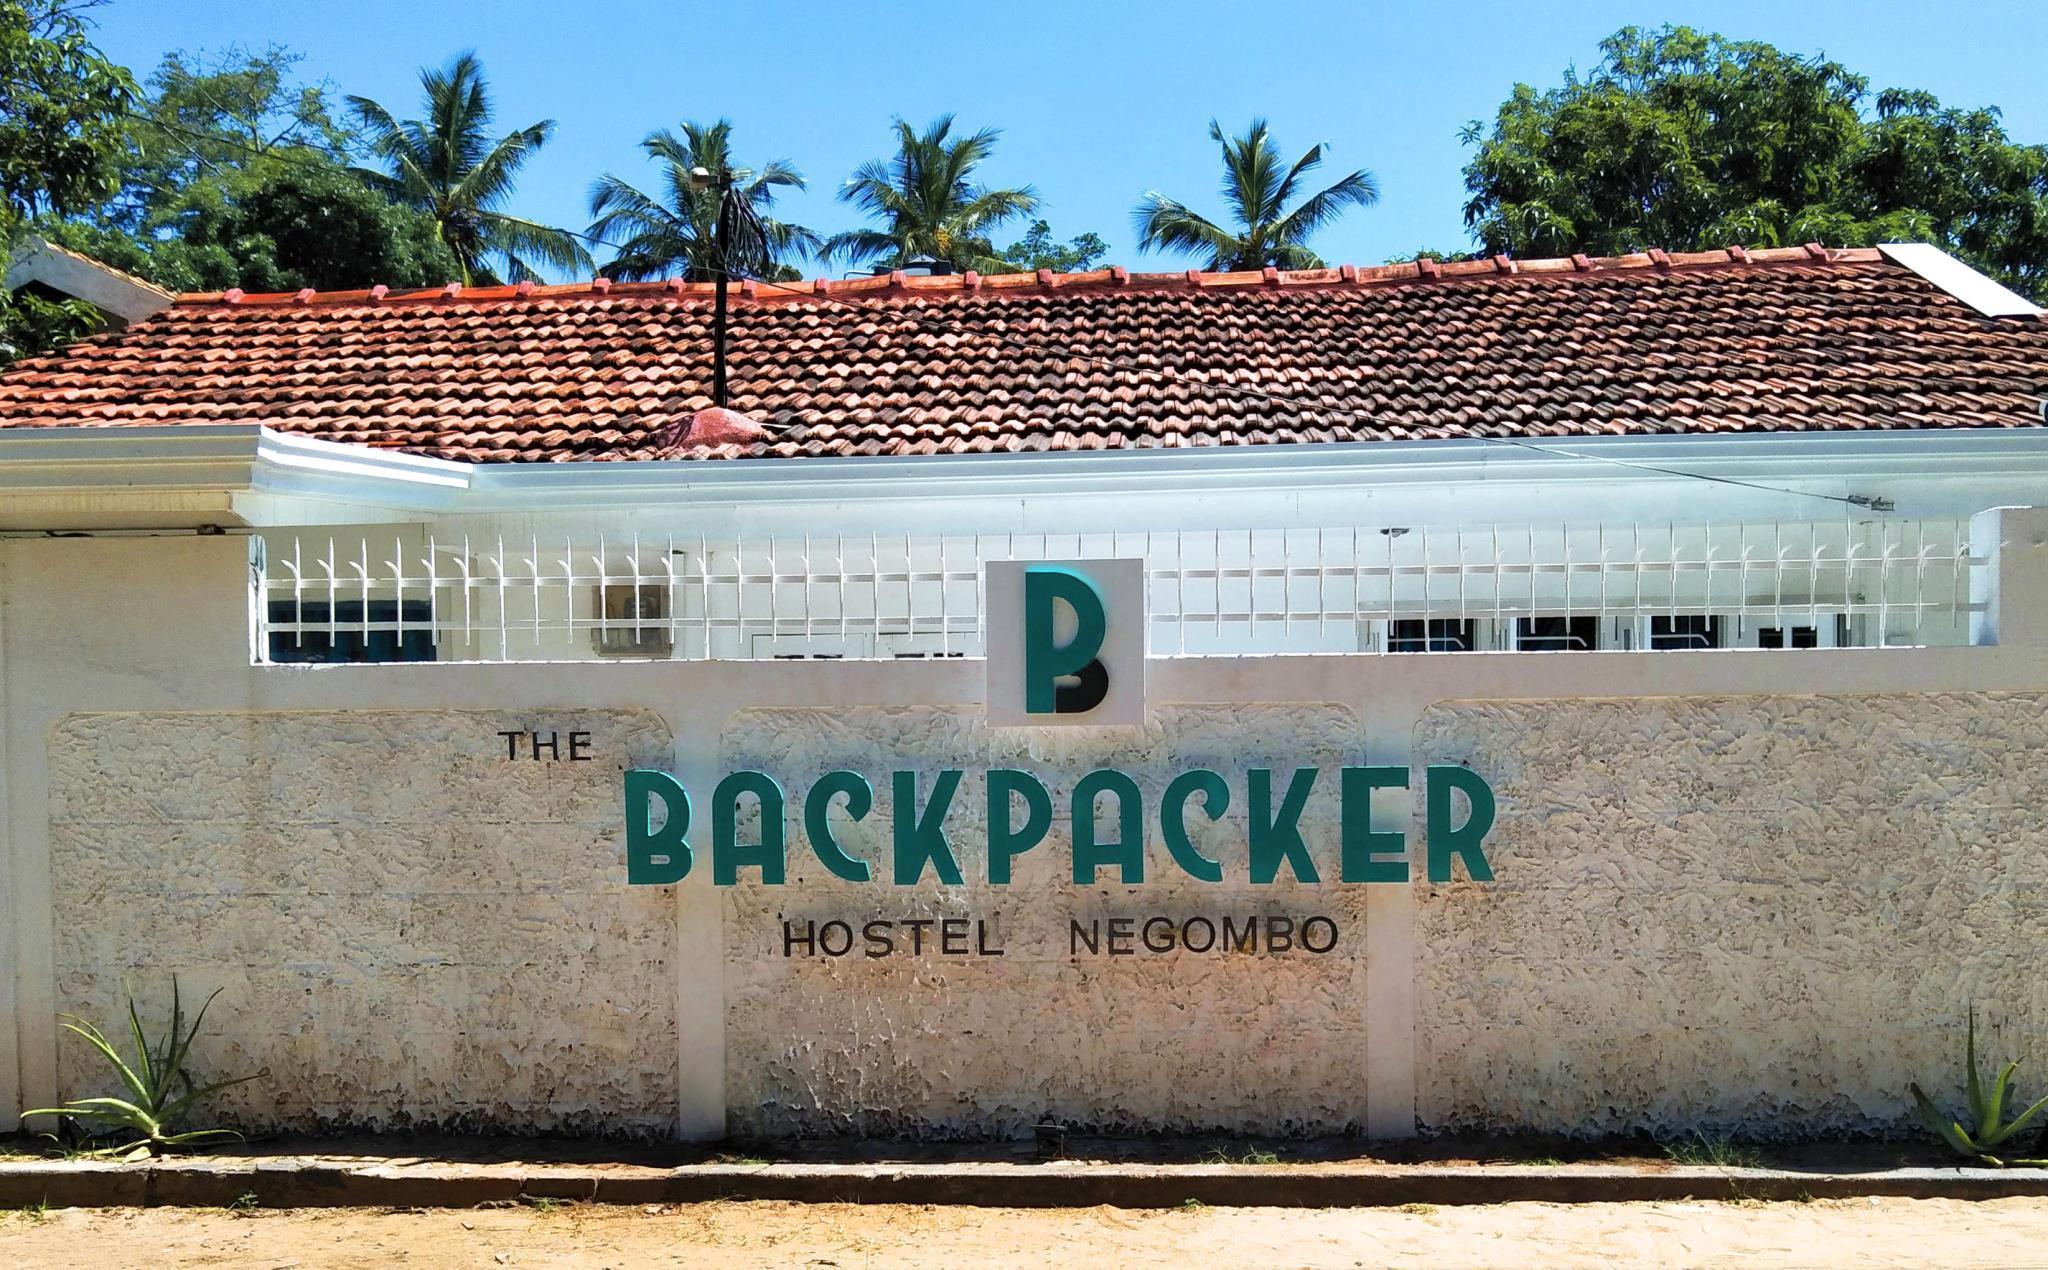 Thebackpacker